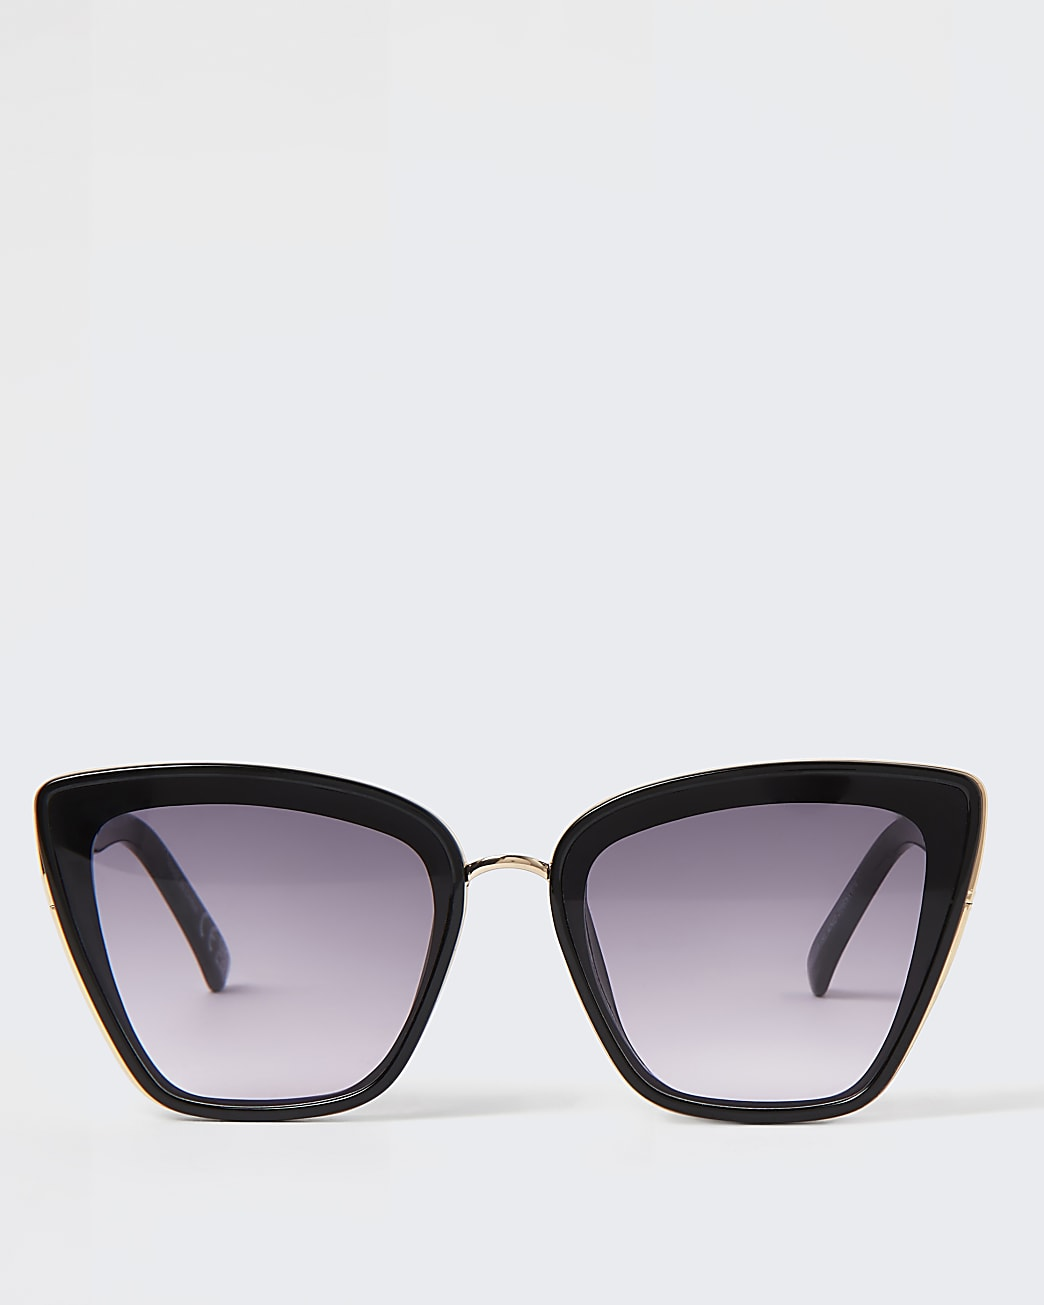 Black oversized cat eye stud sunglasses